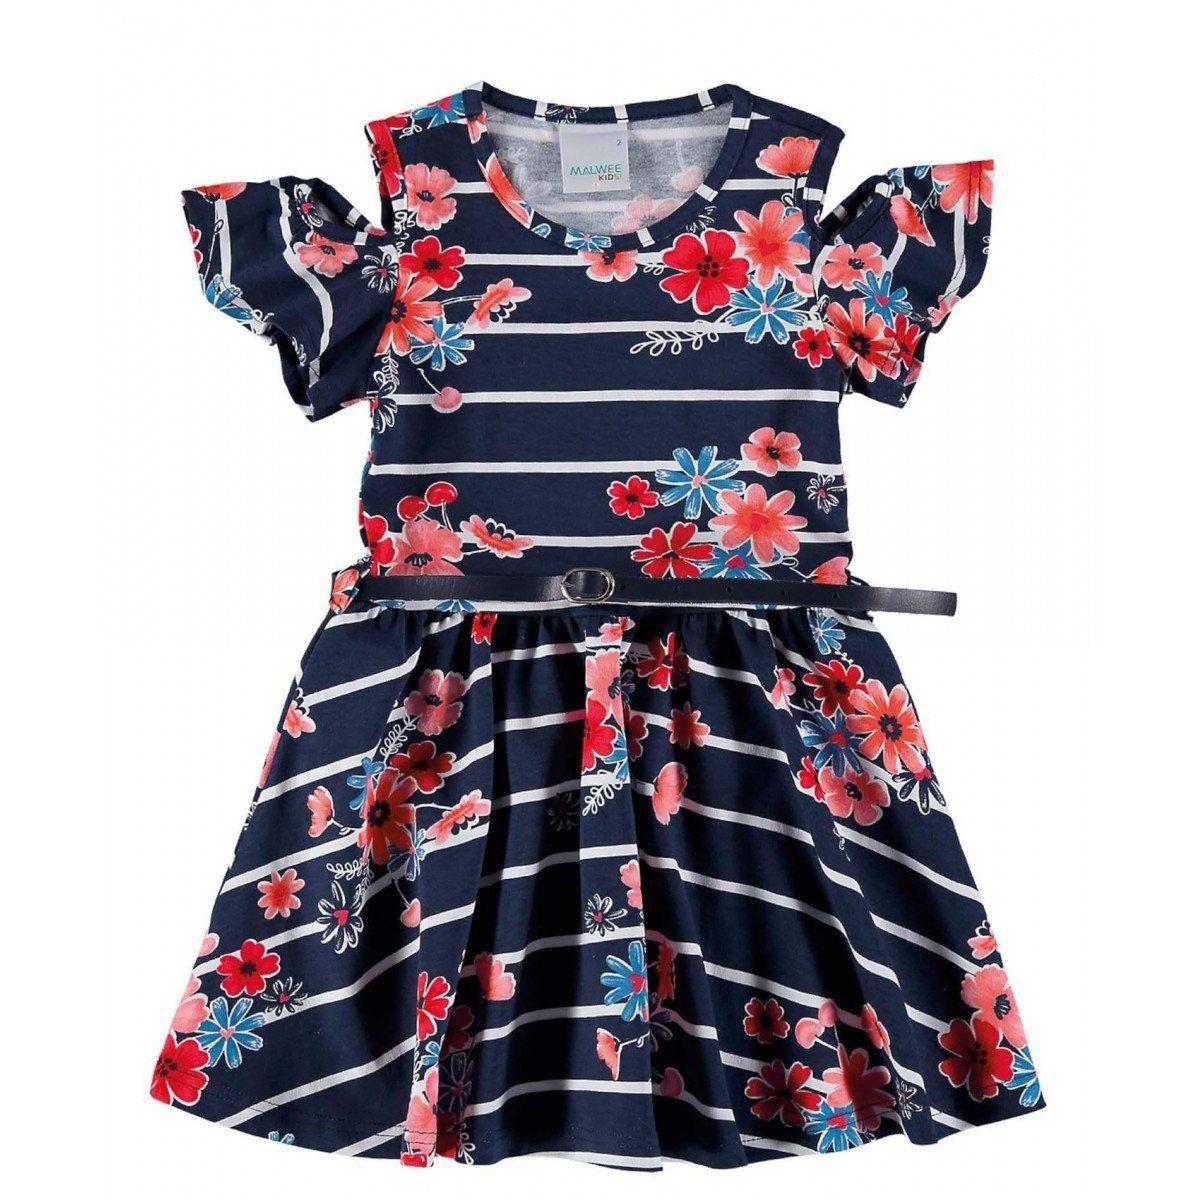 Vestido Infantil Azul Marinho Listras Malwee